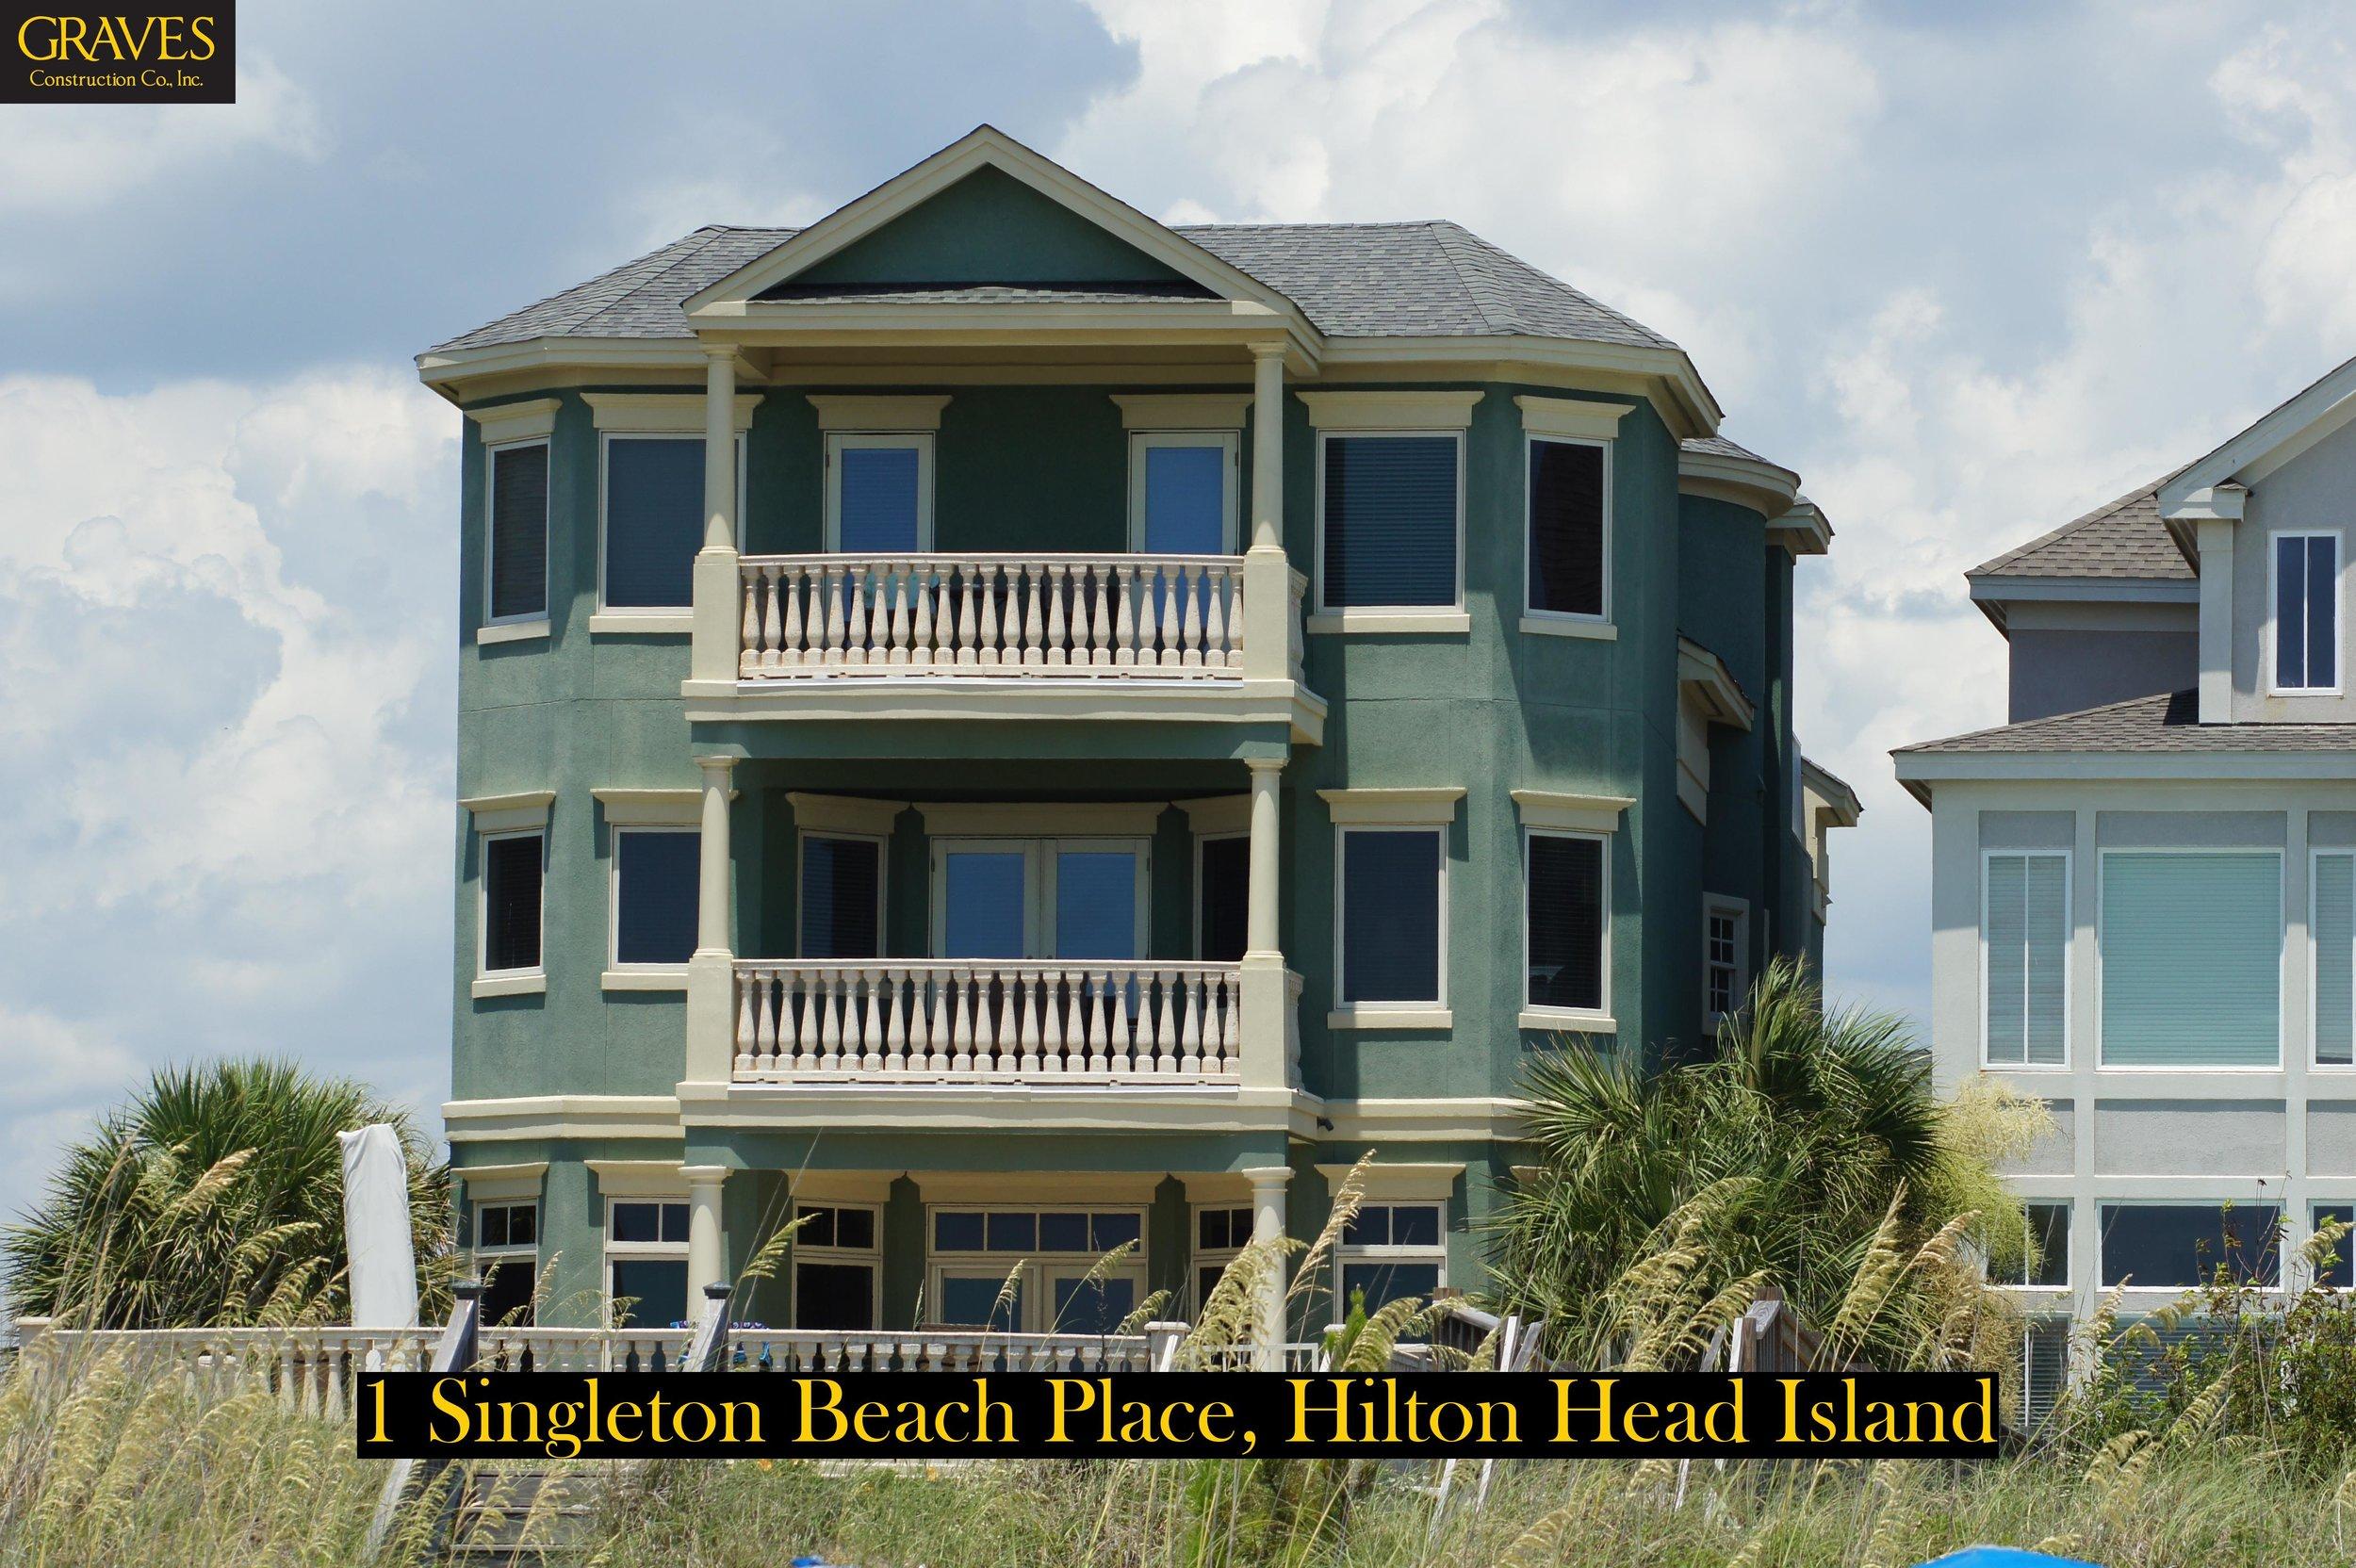 1 Singleton Beach Pl - 2